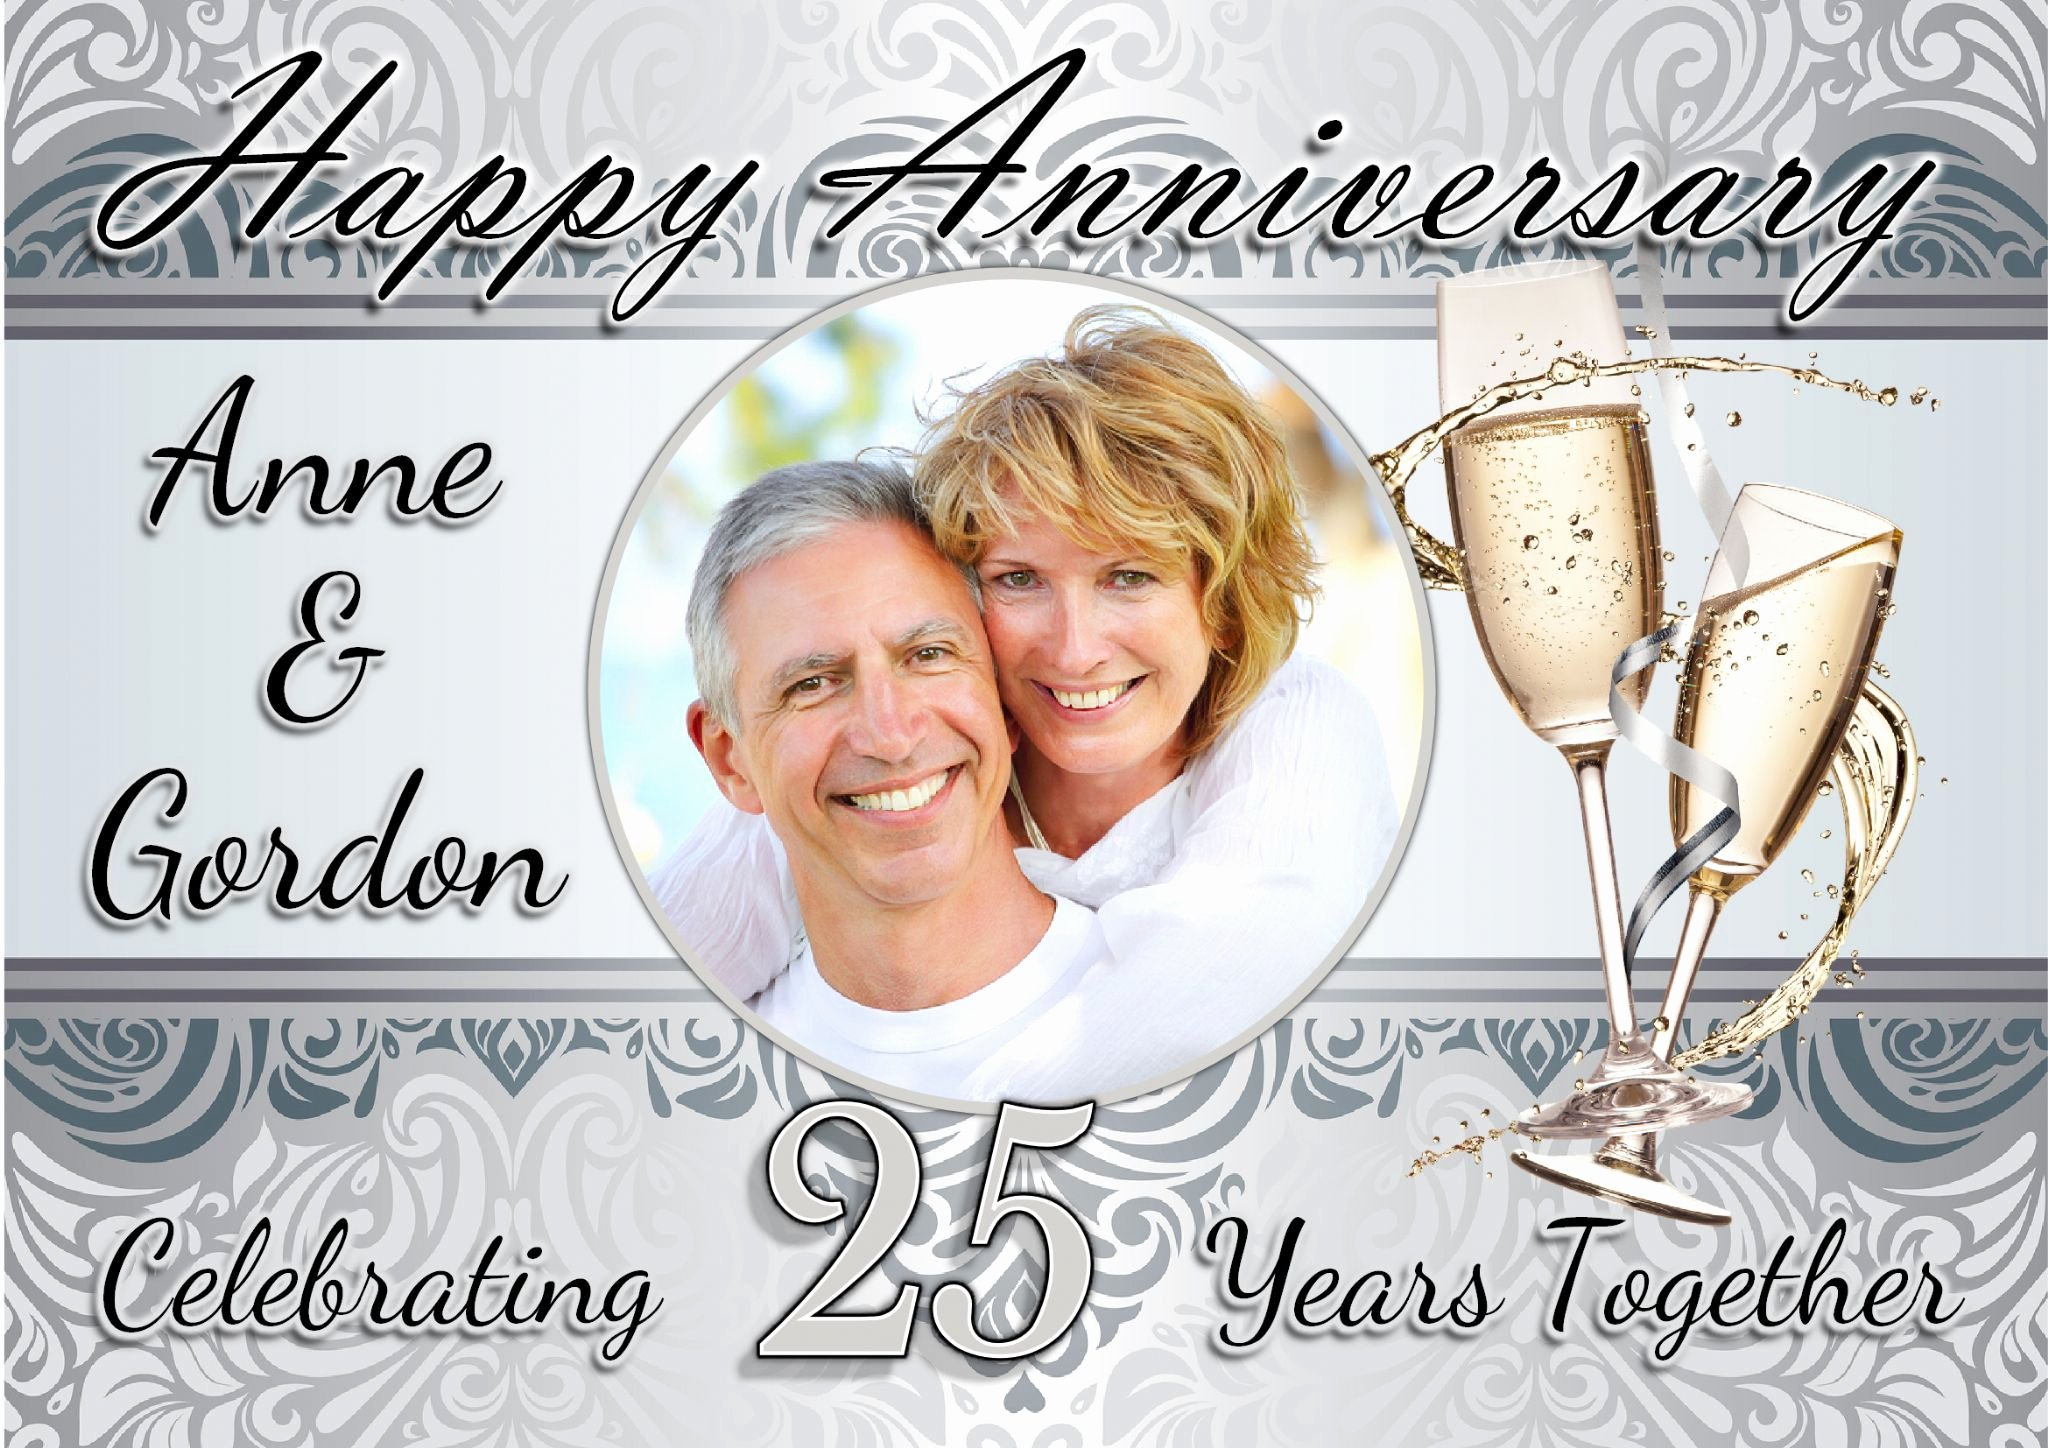 25th Wedding Anniversary Invitations Templates Elegant 25th Wedding Anniversary Invitations Templates Free Wedding Invitations